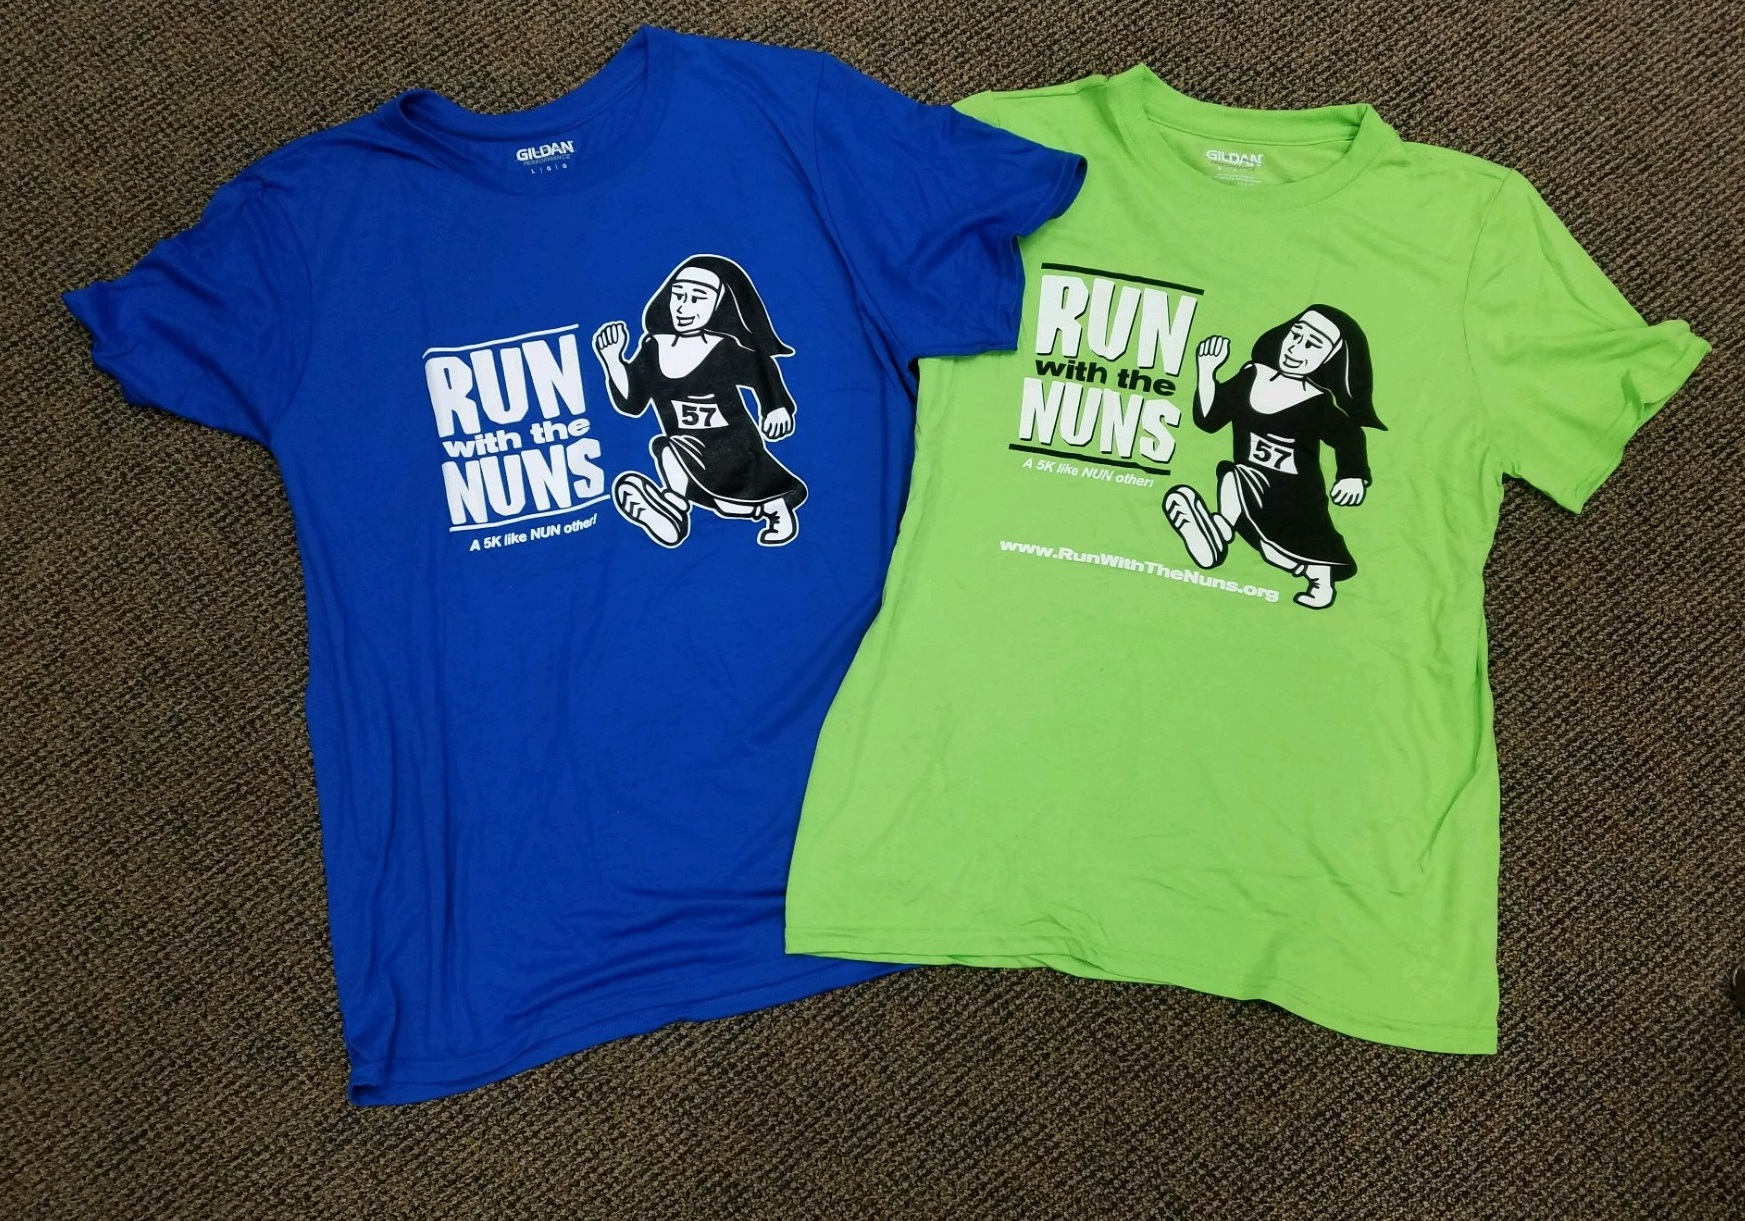 5K shirts 2017